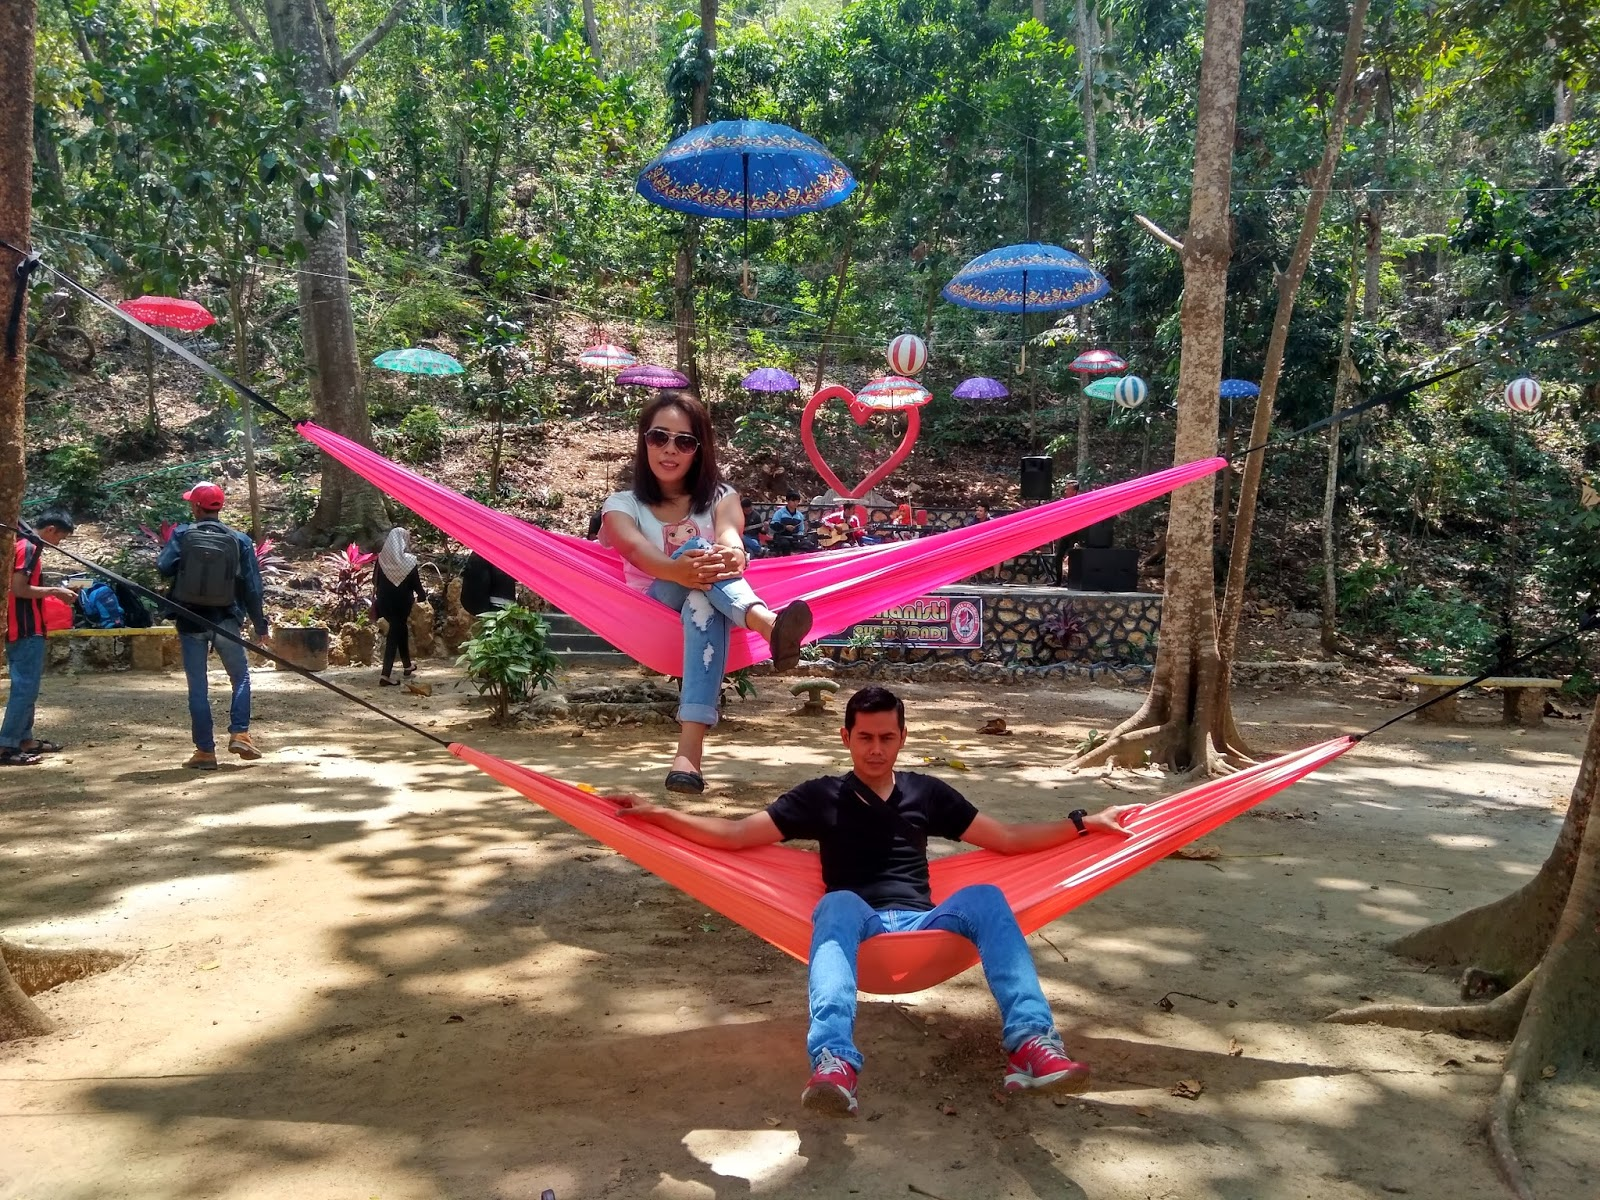 Jatipohon Tujuan Wisata Favorit Kabupaten Grobogan Obyek Tak Asing Bagi